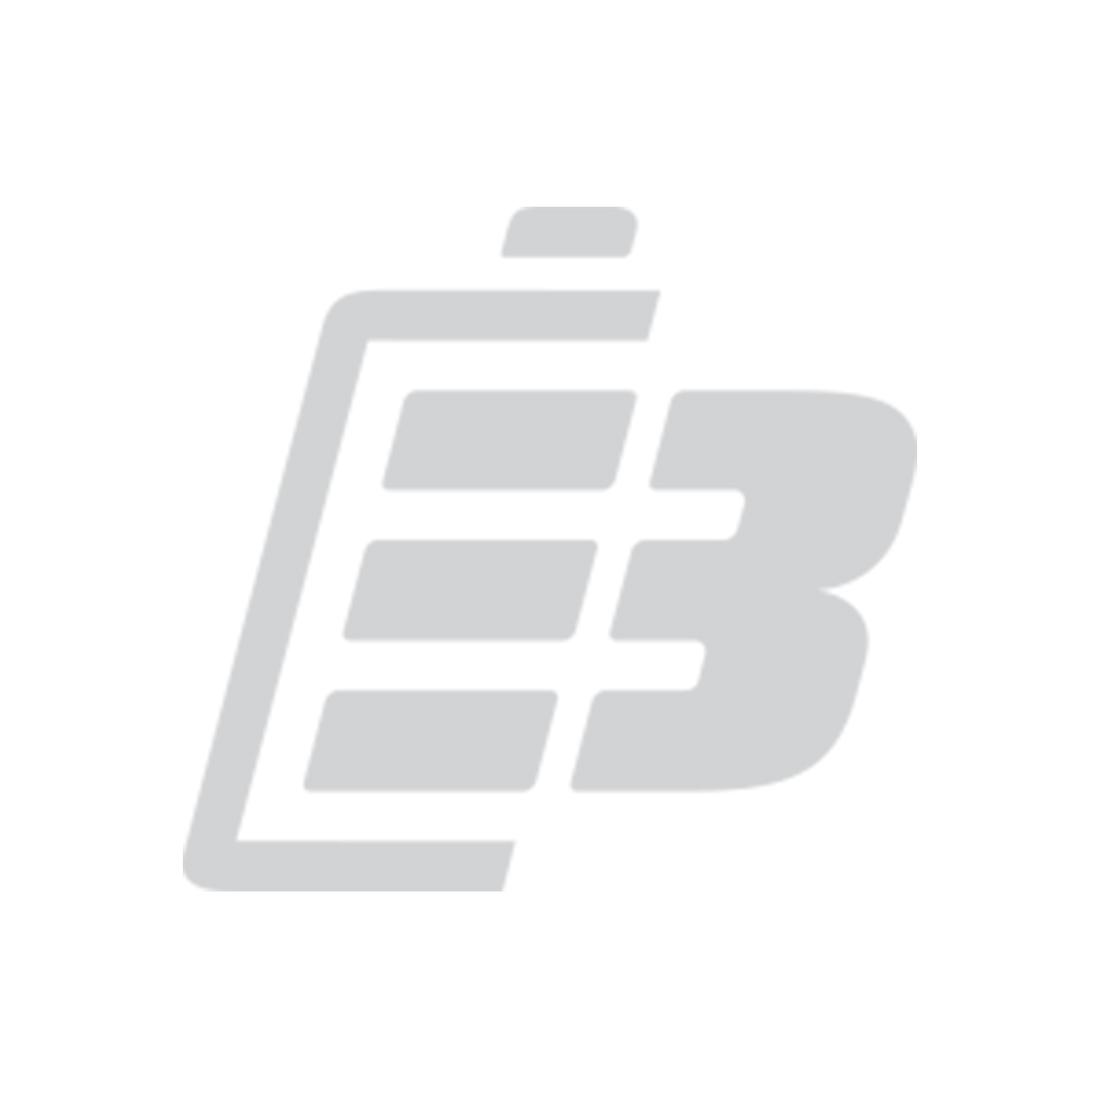 Two-Way radio battery Motorola MTH800 Tetra_1